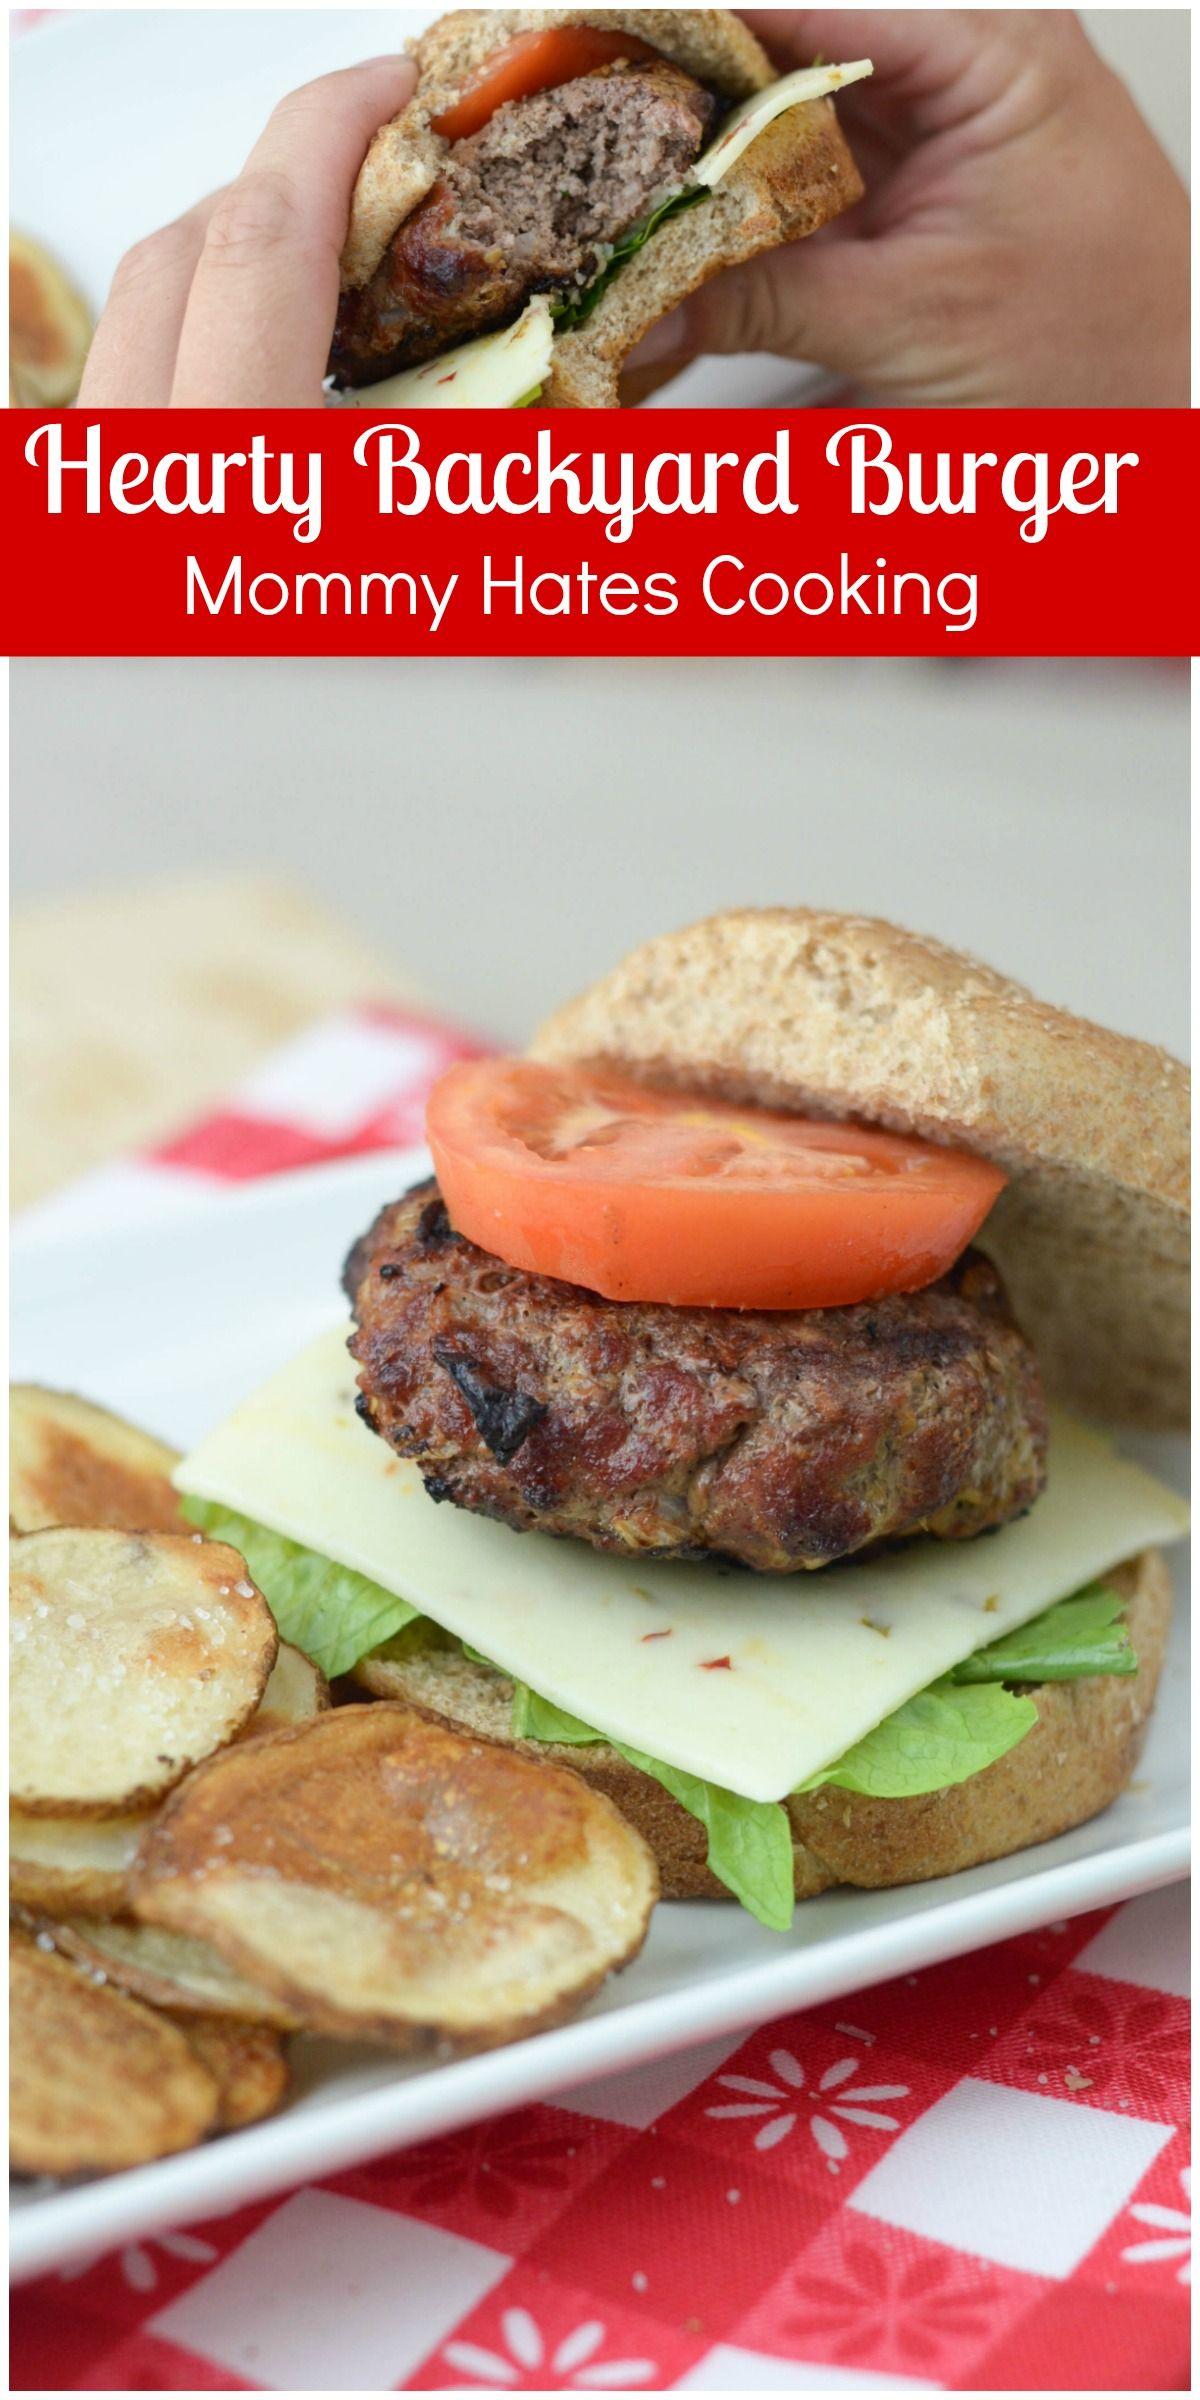 Hearty Backyard Burgers #BurgerTour @GiantFoodStore #ad